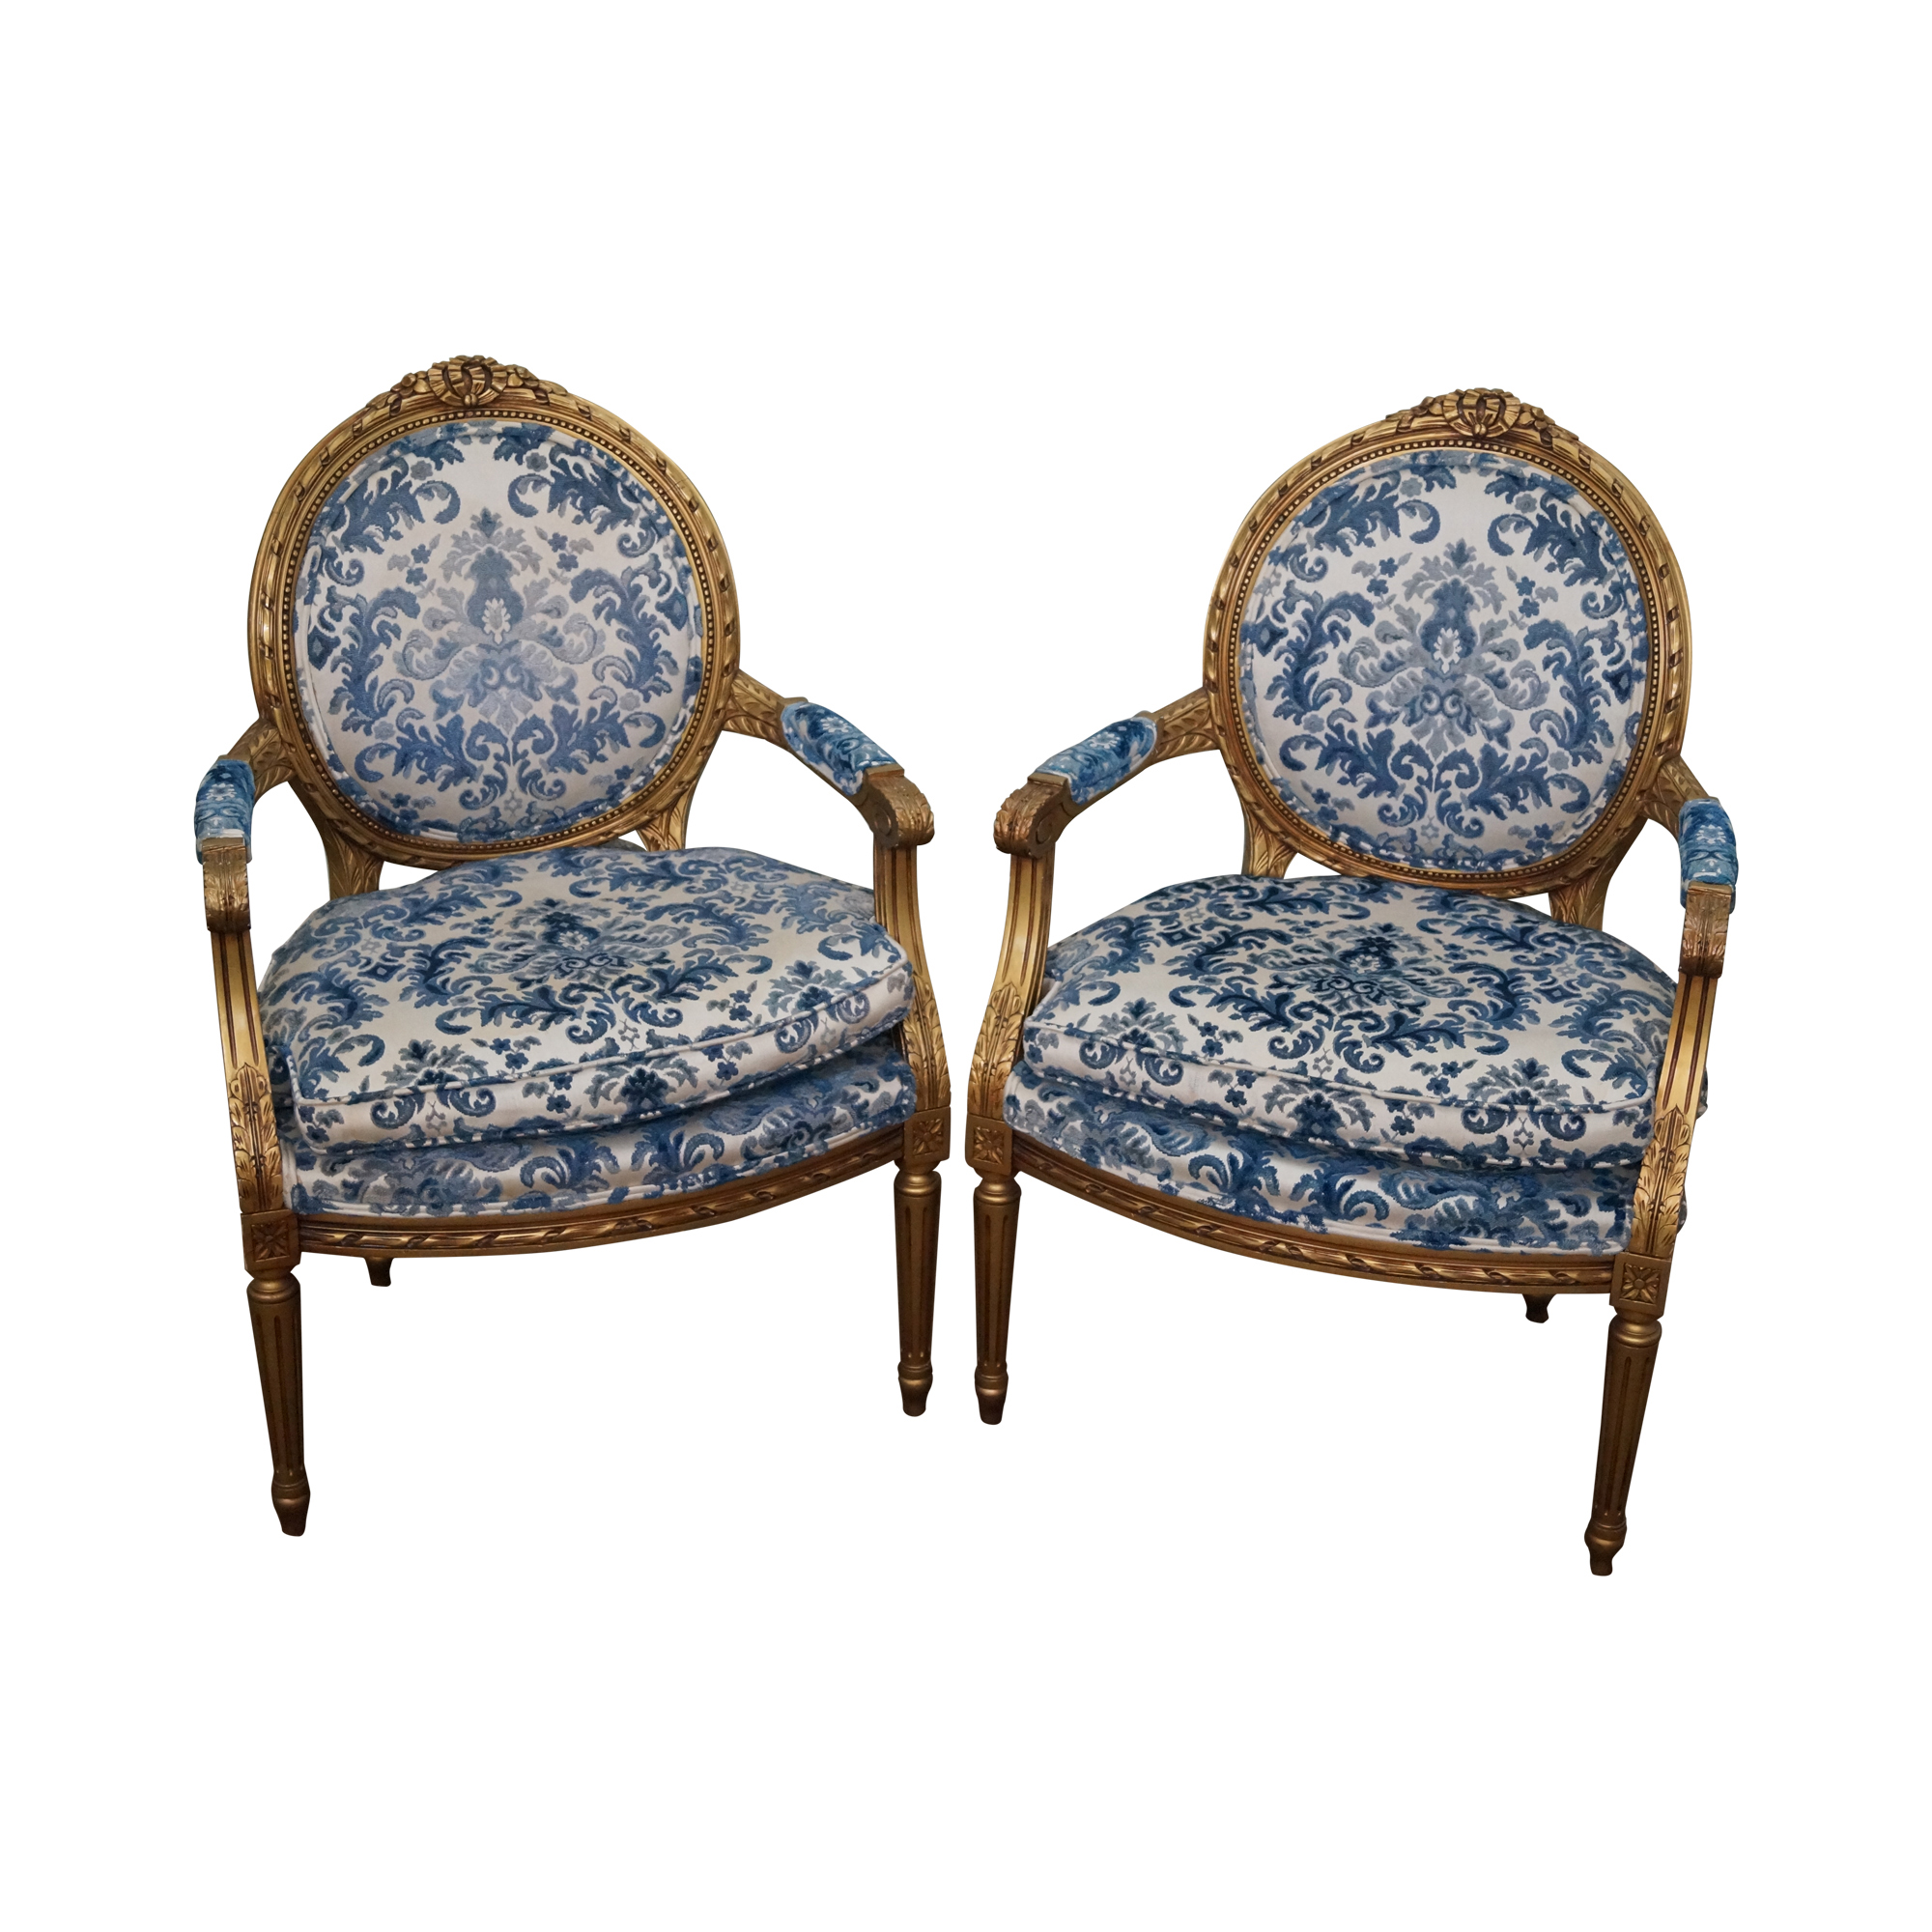 Vintage Gilt French Louis XVI Chairs A Pair